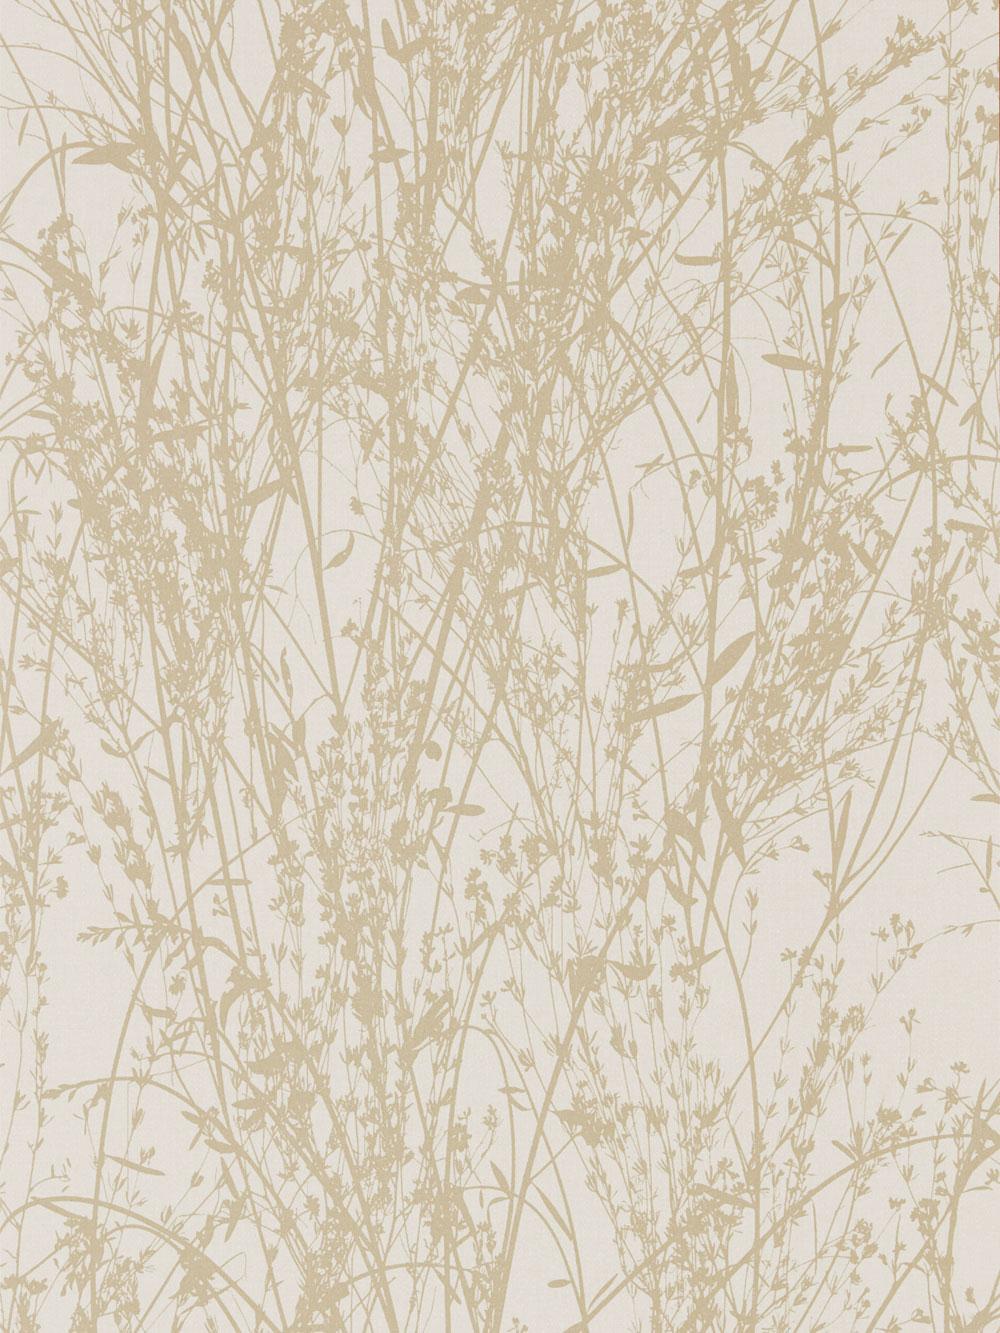 Meadow Canvas Wallpaper - Wheat / Cream - by Sanderson